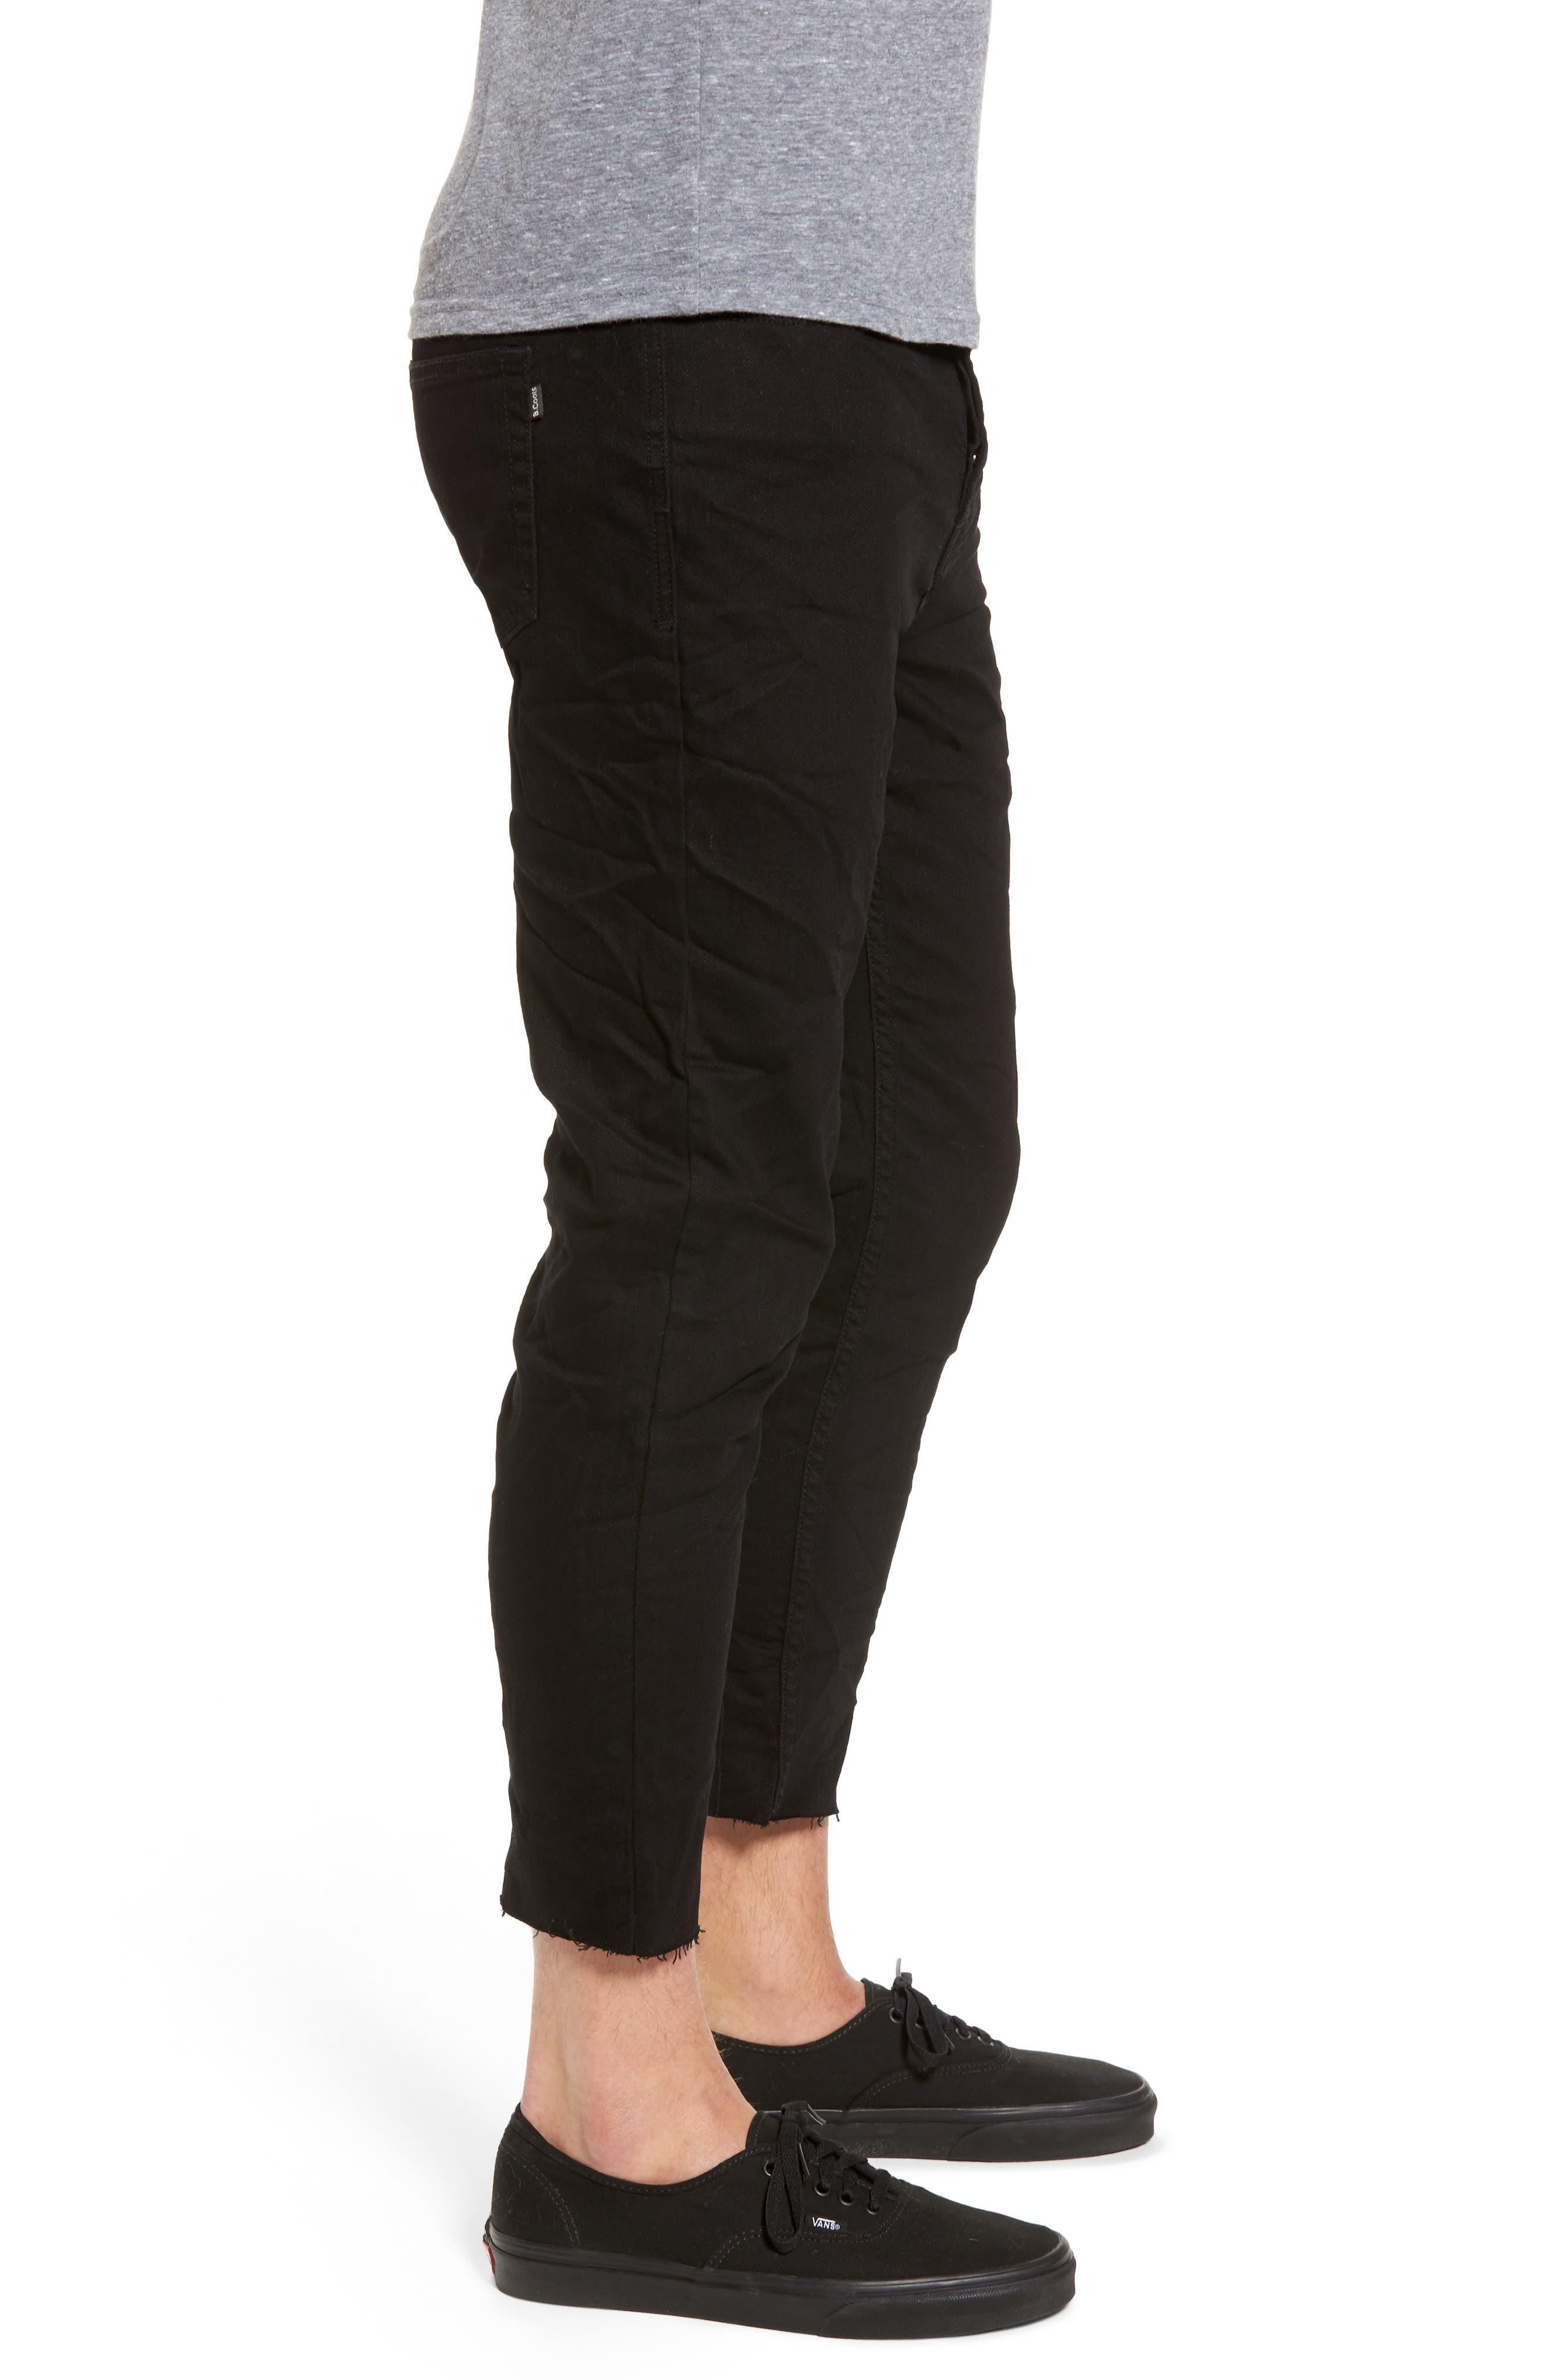 B.Line Crop Slim Fit Jeans,                             Alternate thumbnail 3, color,                             Washed Black